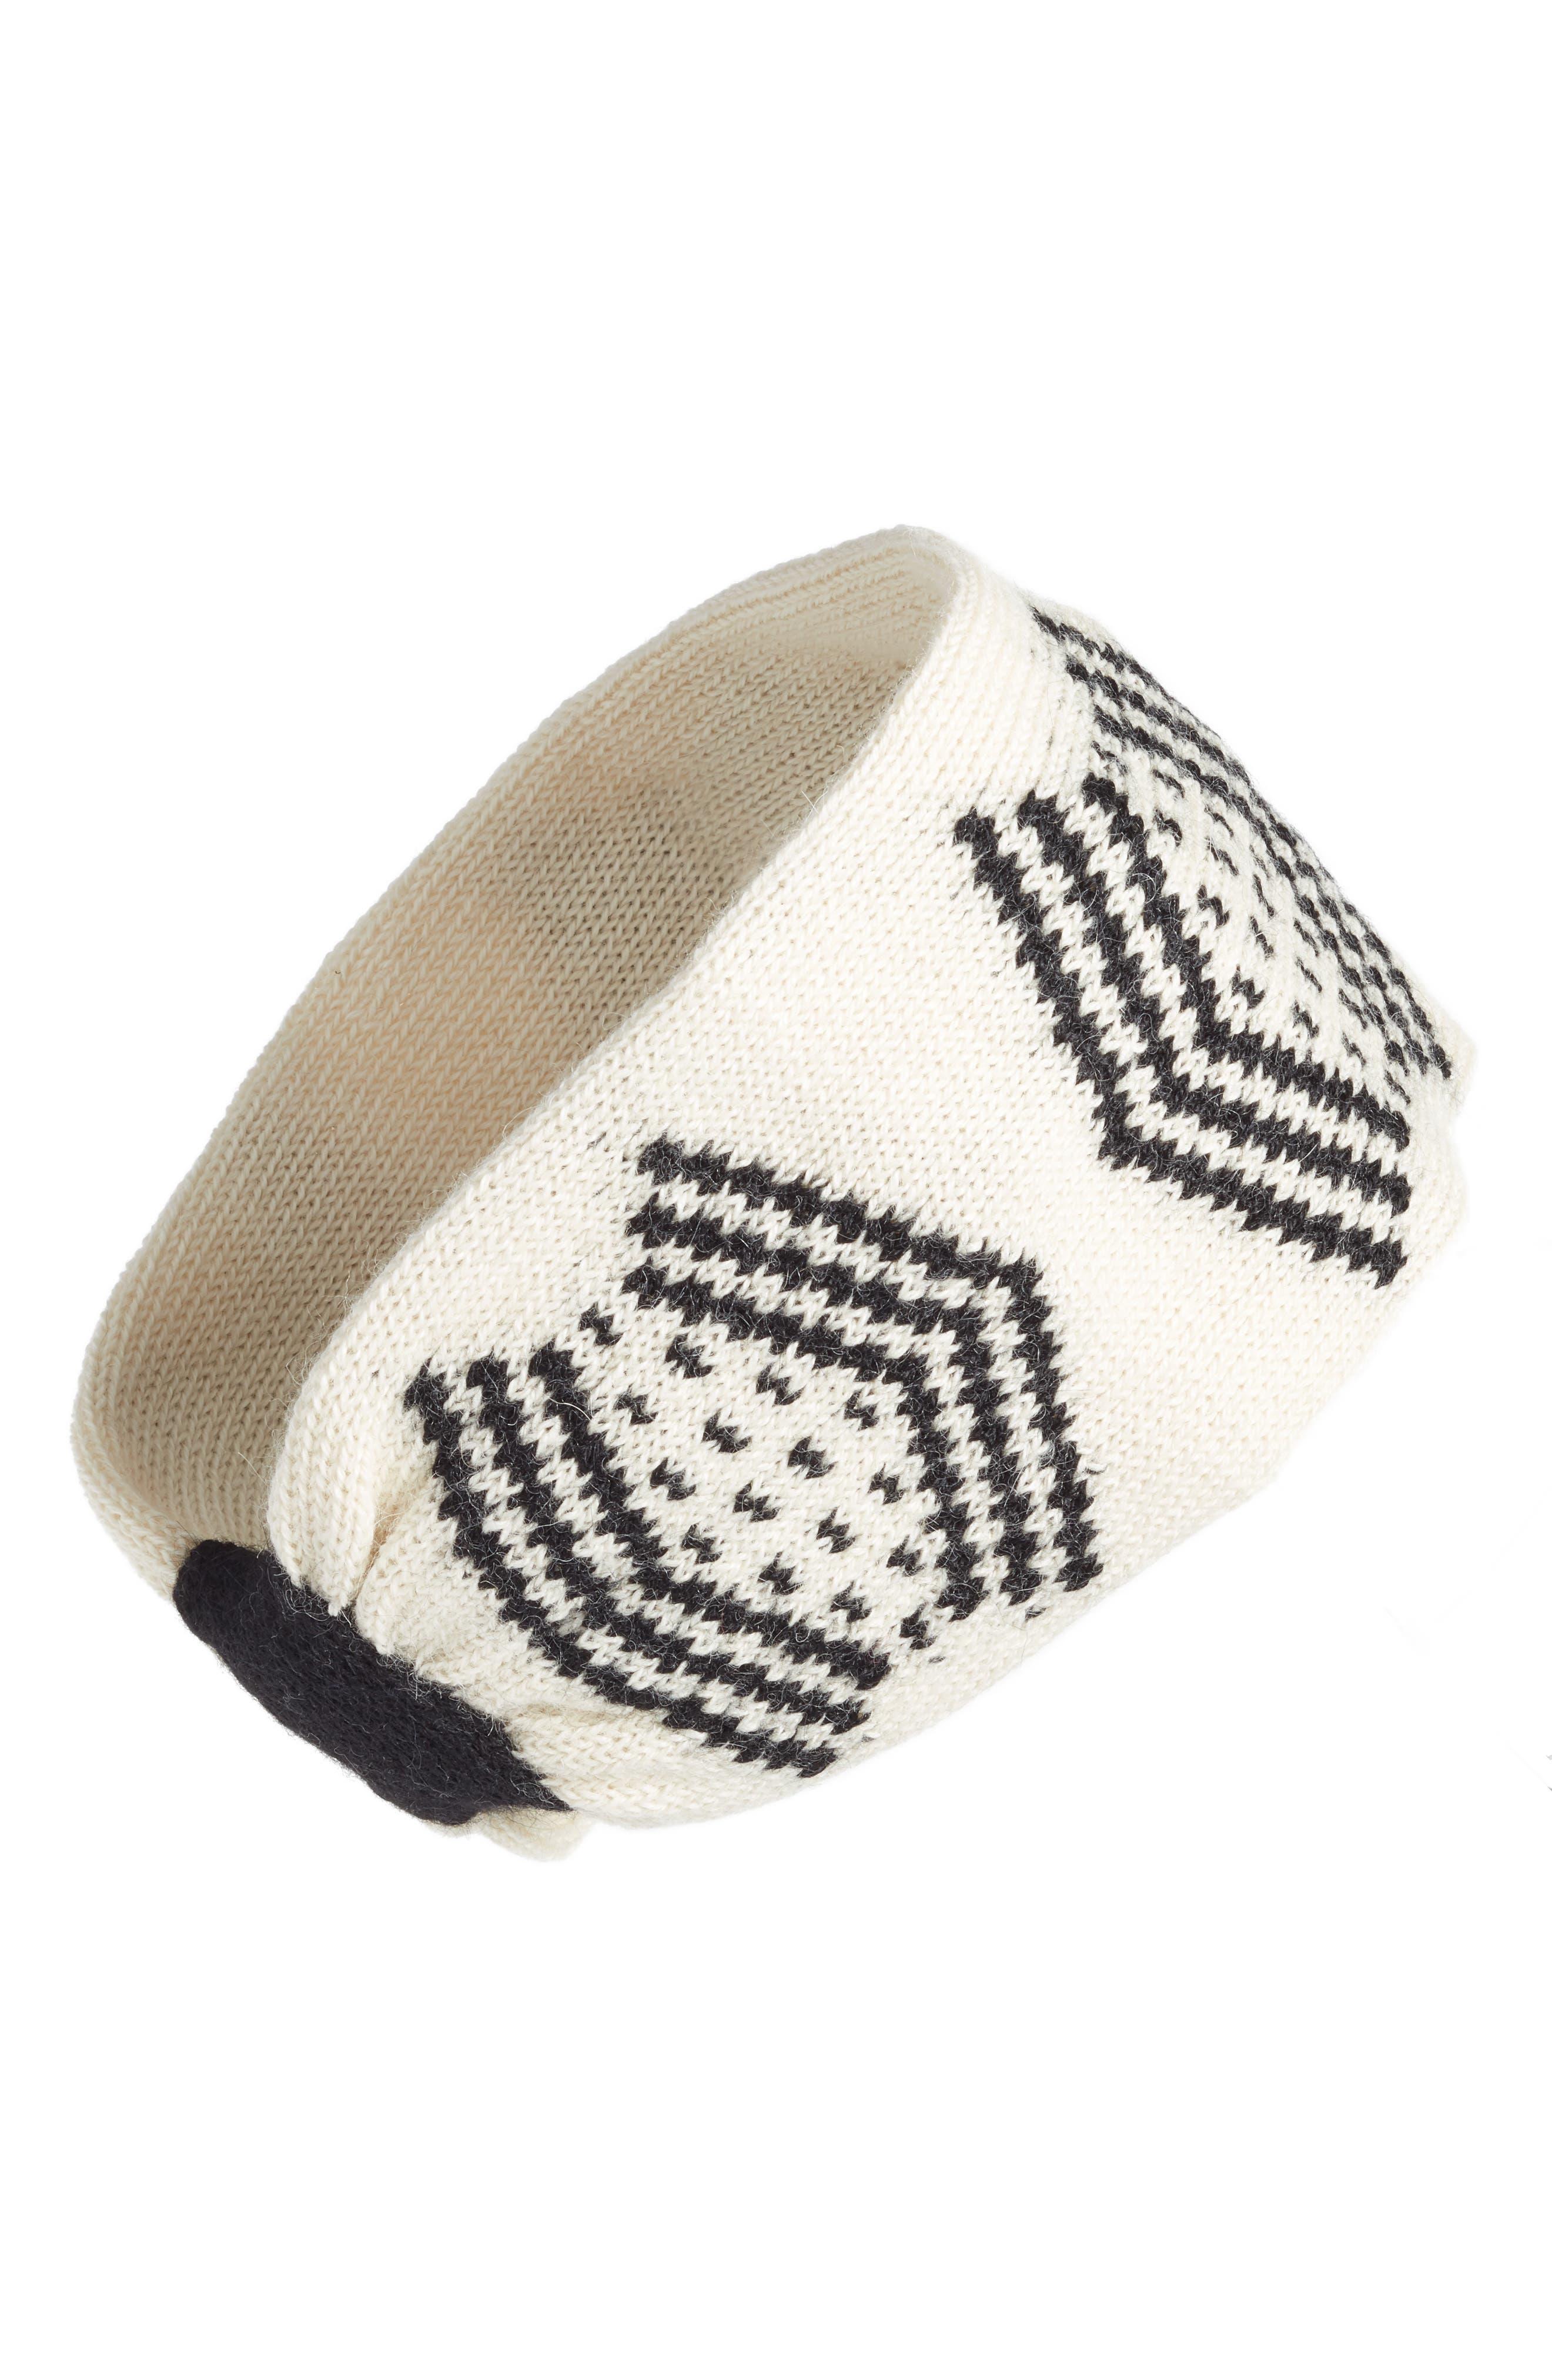 LAMINI Tribeca Alpaca Headband